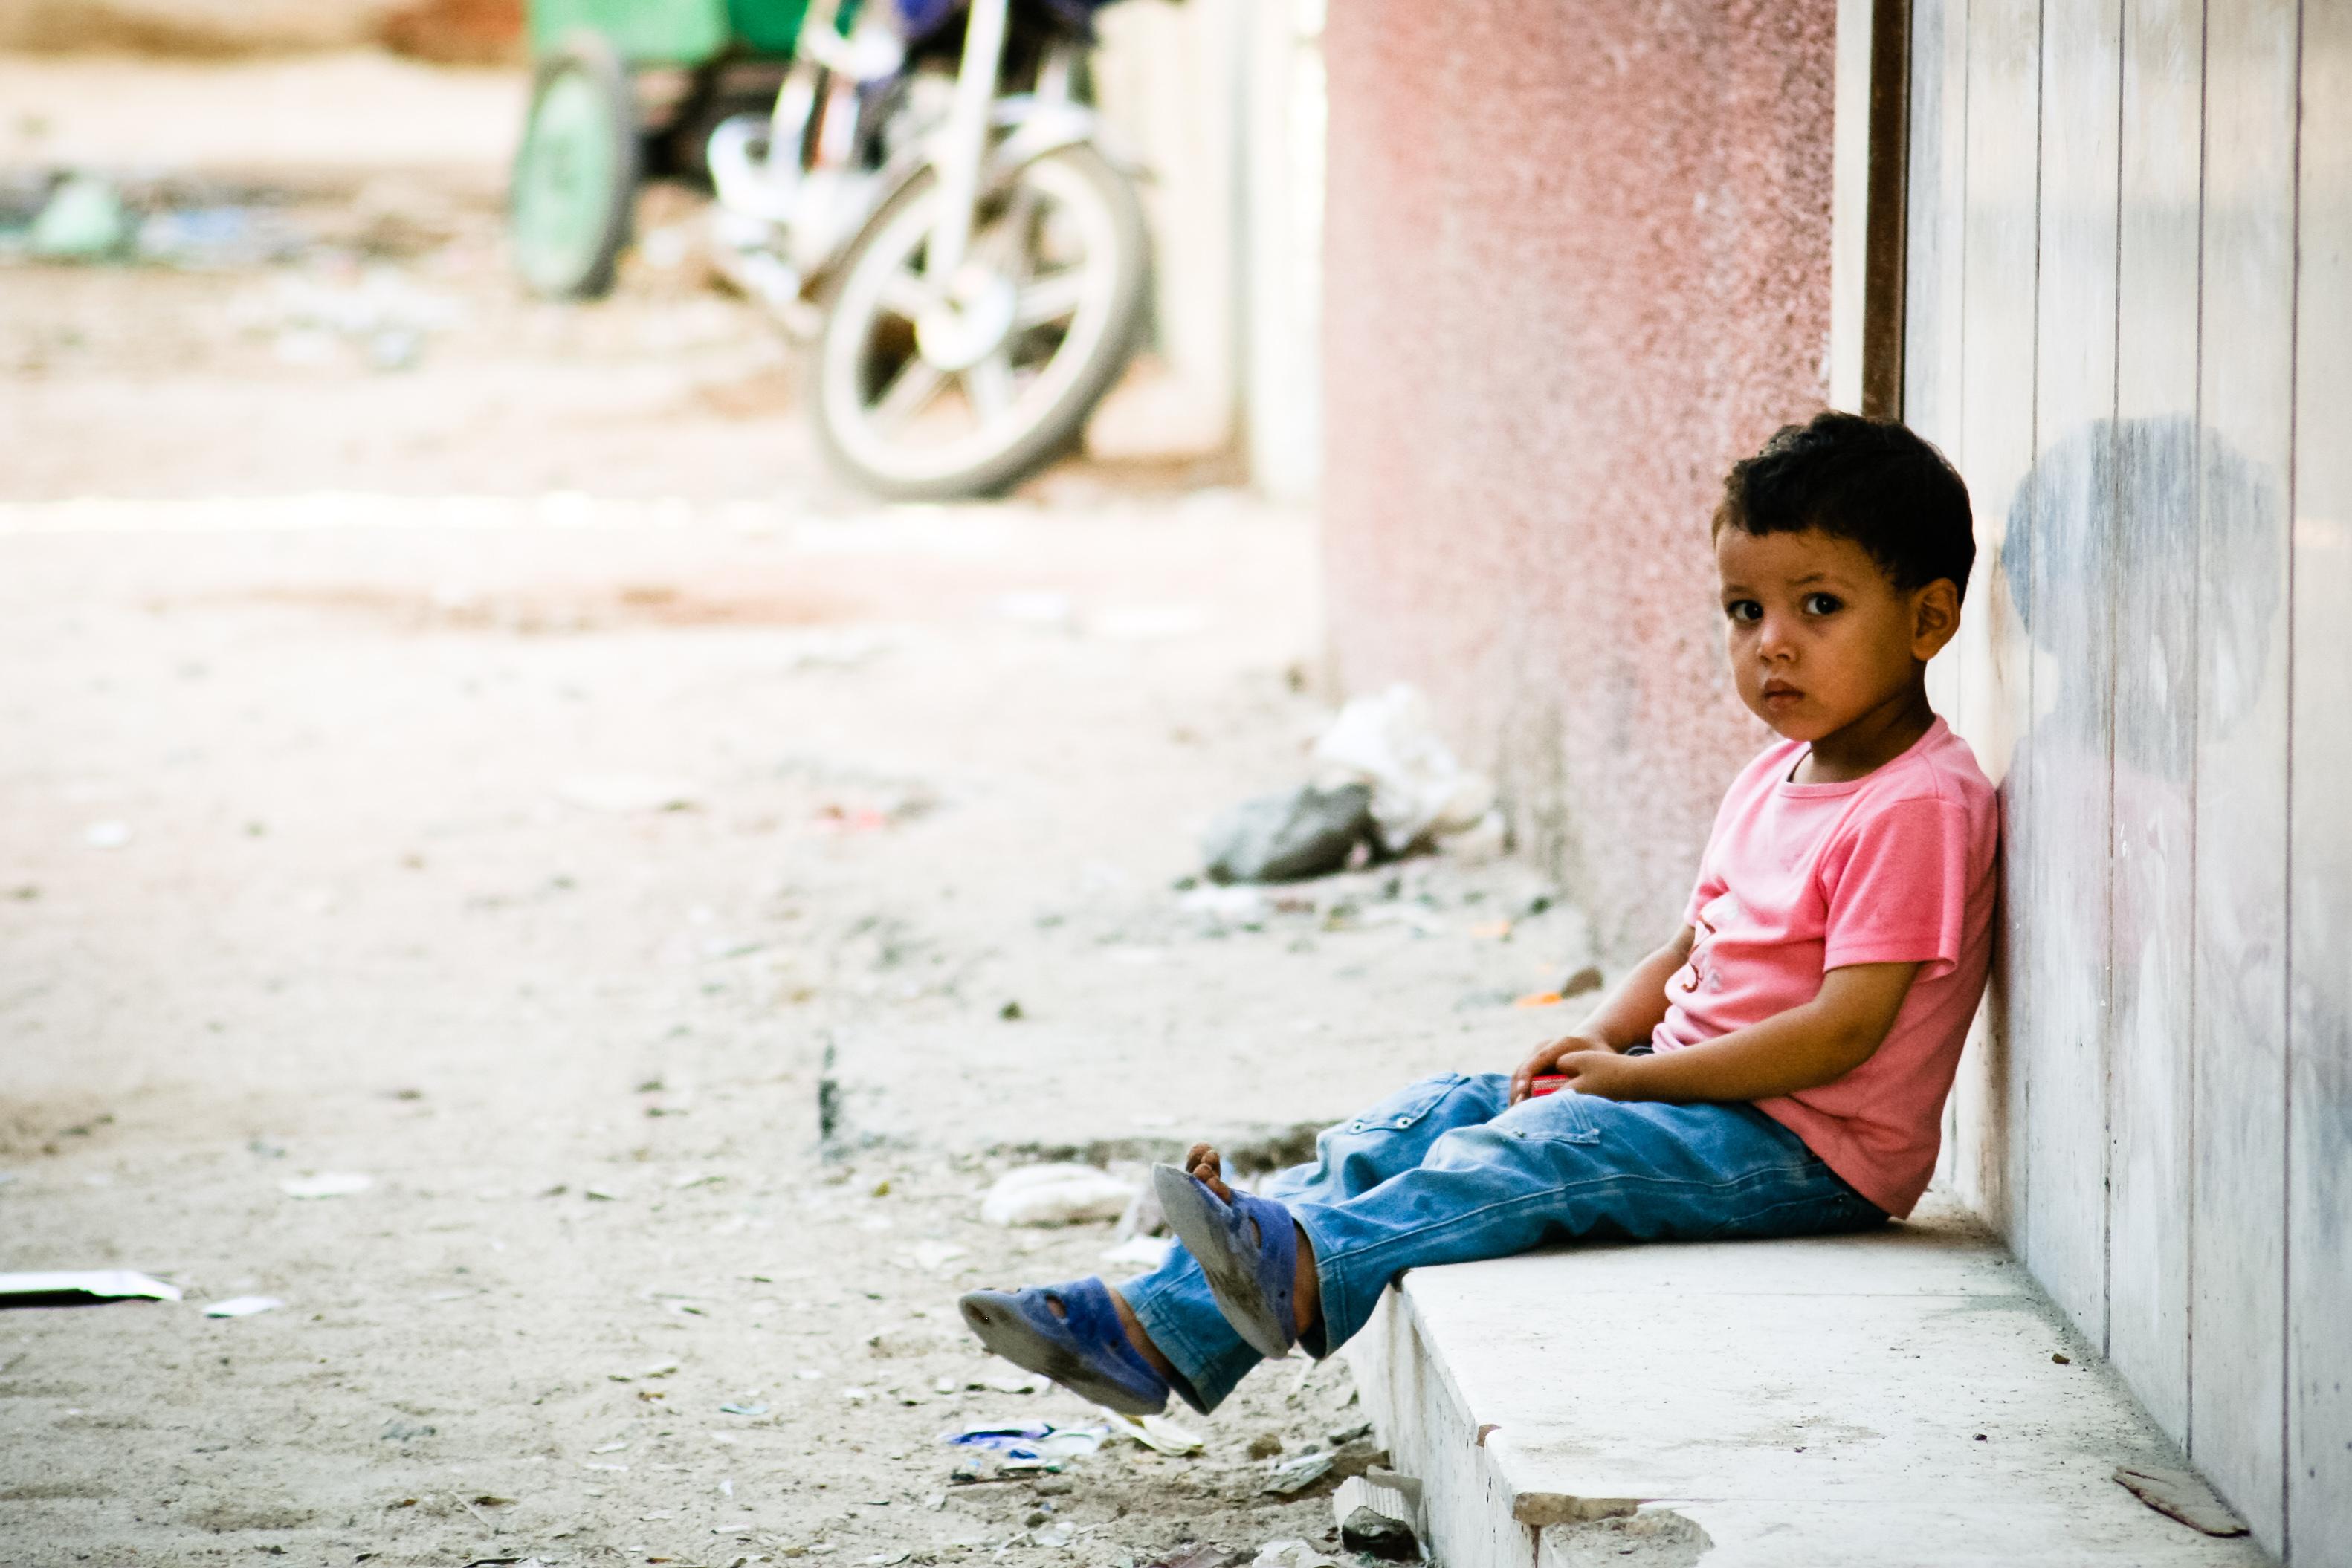 Sad little boy waiting outside photo